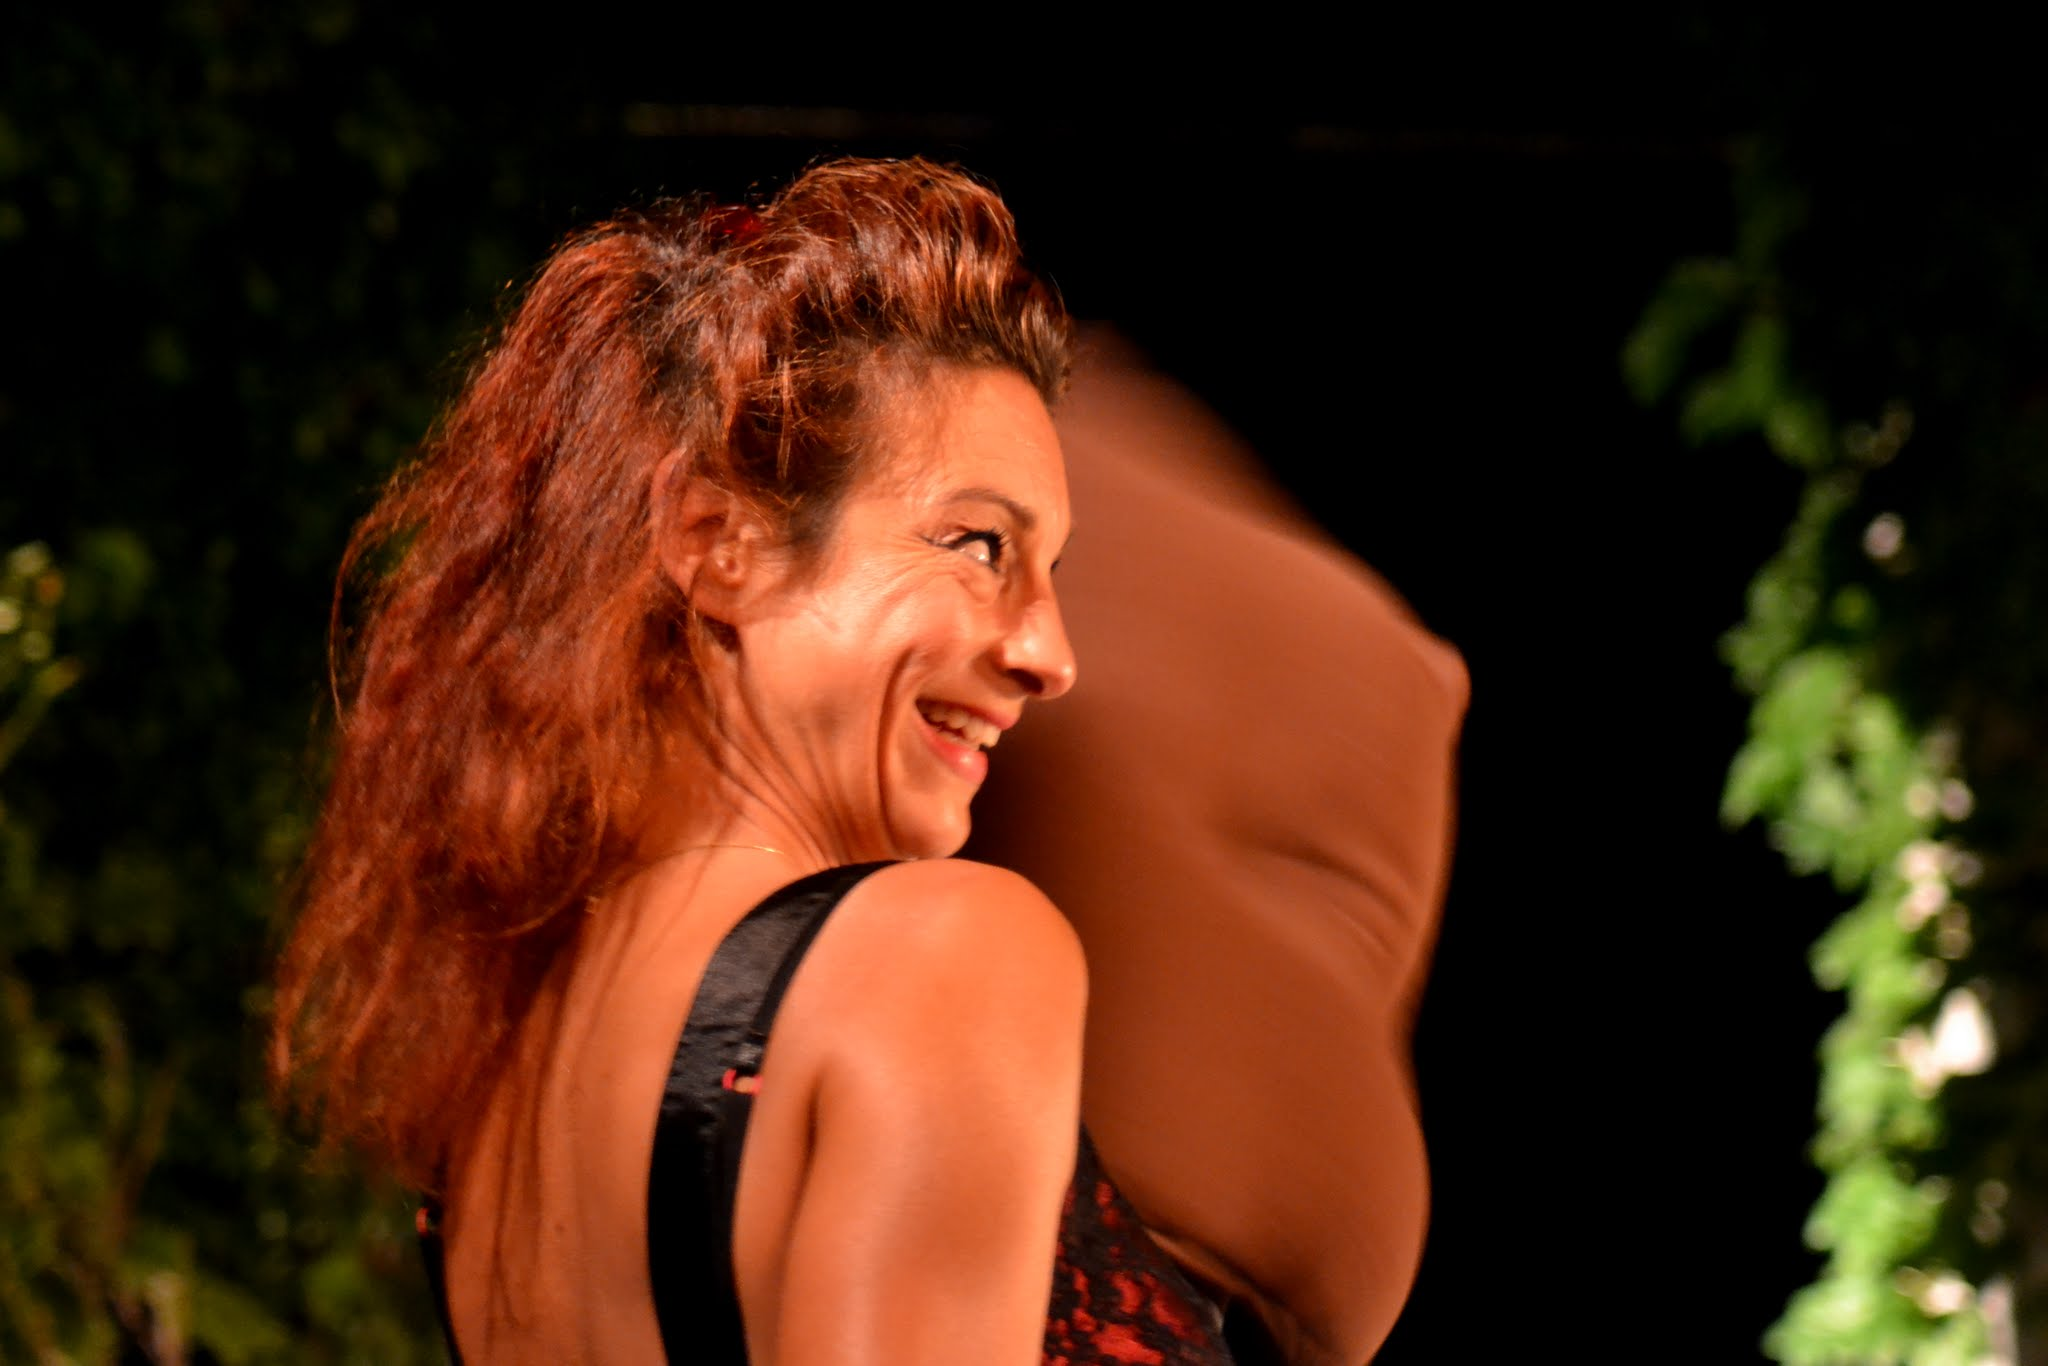 FCVT-2017-Marion tritta-Dame de chez Maxim (18)